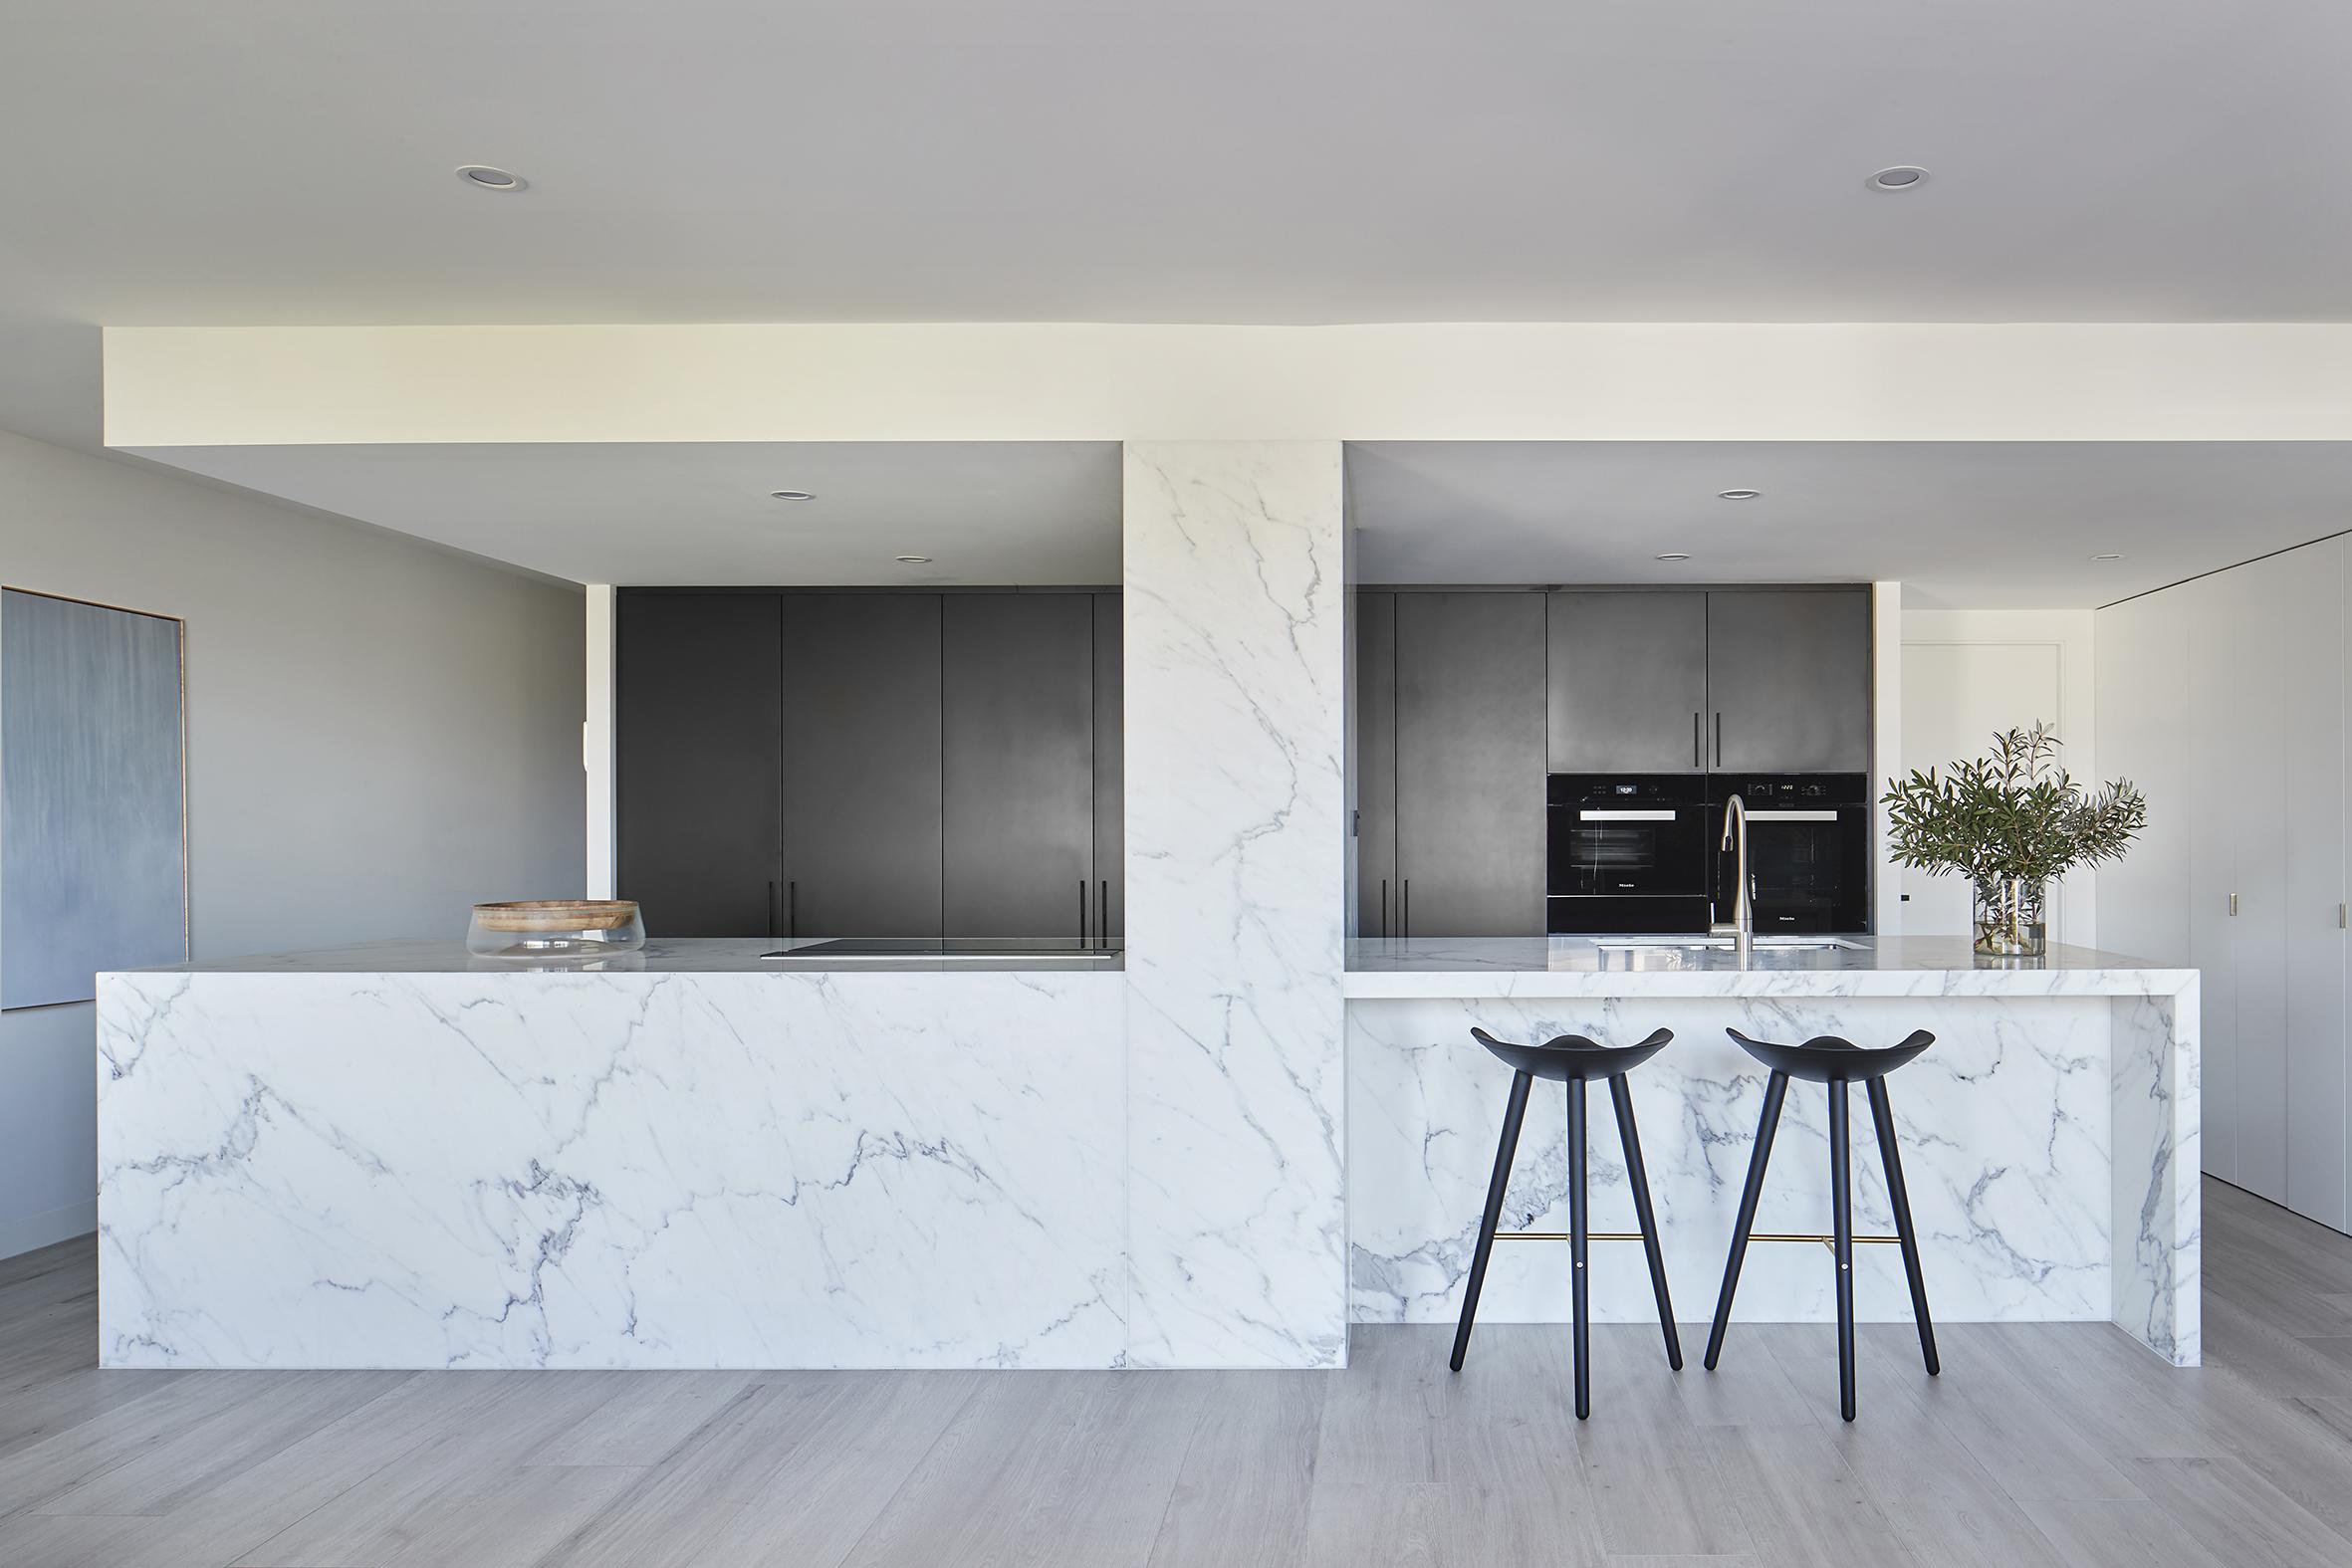 Gallery Of Compartment Apartment Local Australian Architecture & Design Richmond, Melbourne Image 7